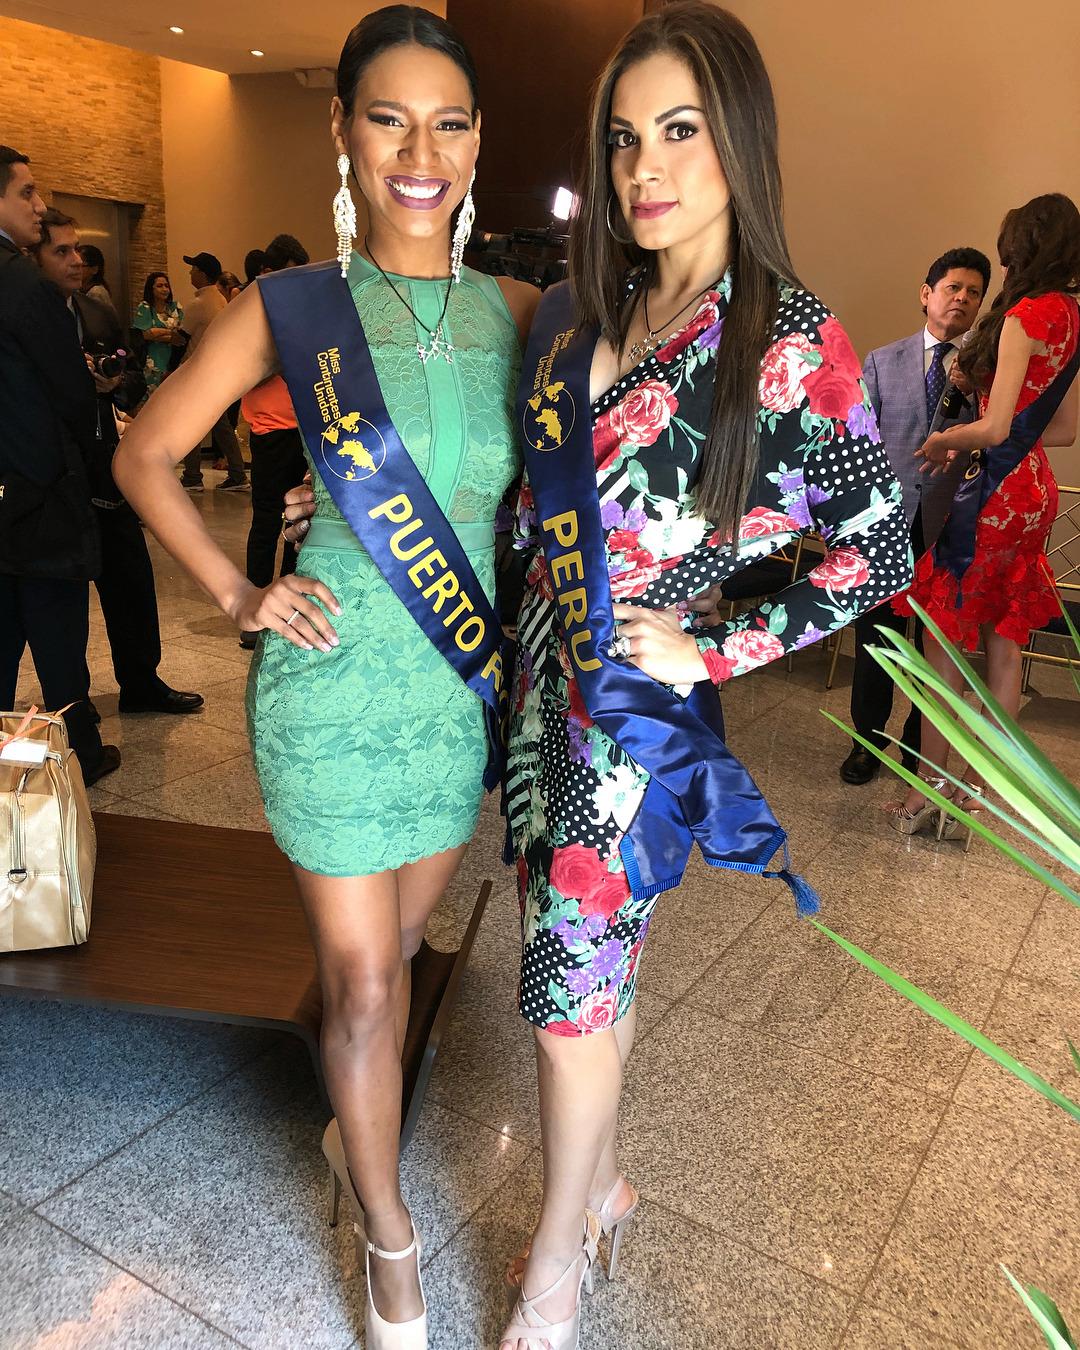 patricia seminario, miss peru continentes unidos 2018/miss asia pacific peru 2017. - Página 3 40503910